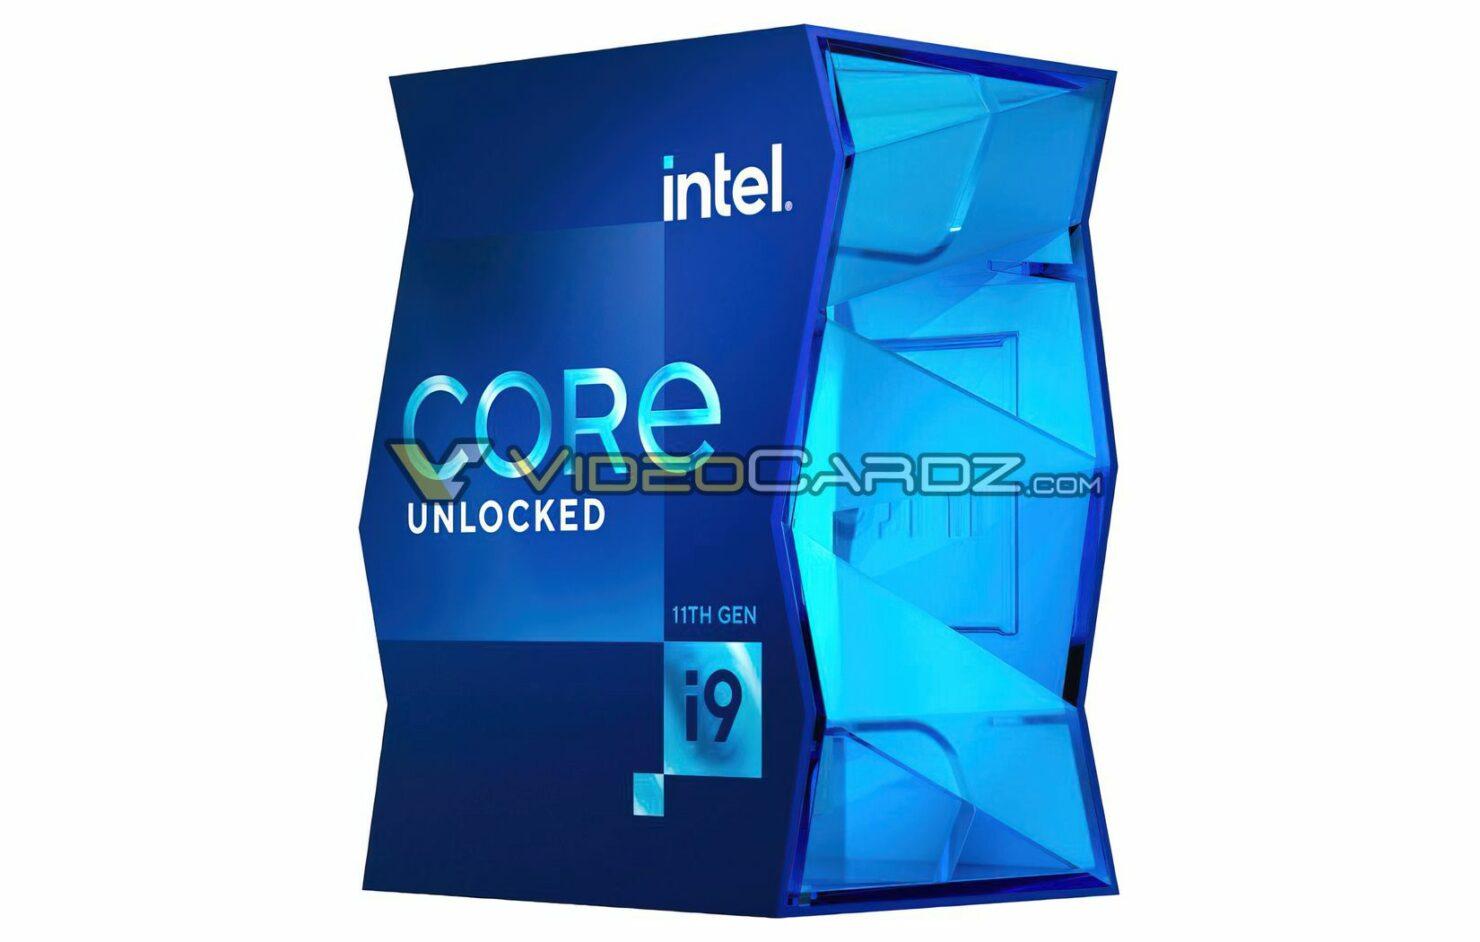 intel-core-i9-11900k-rocket-lake-desktop-cpu-_1-2